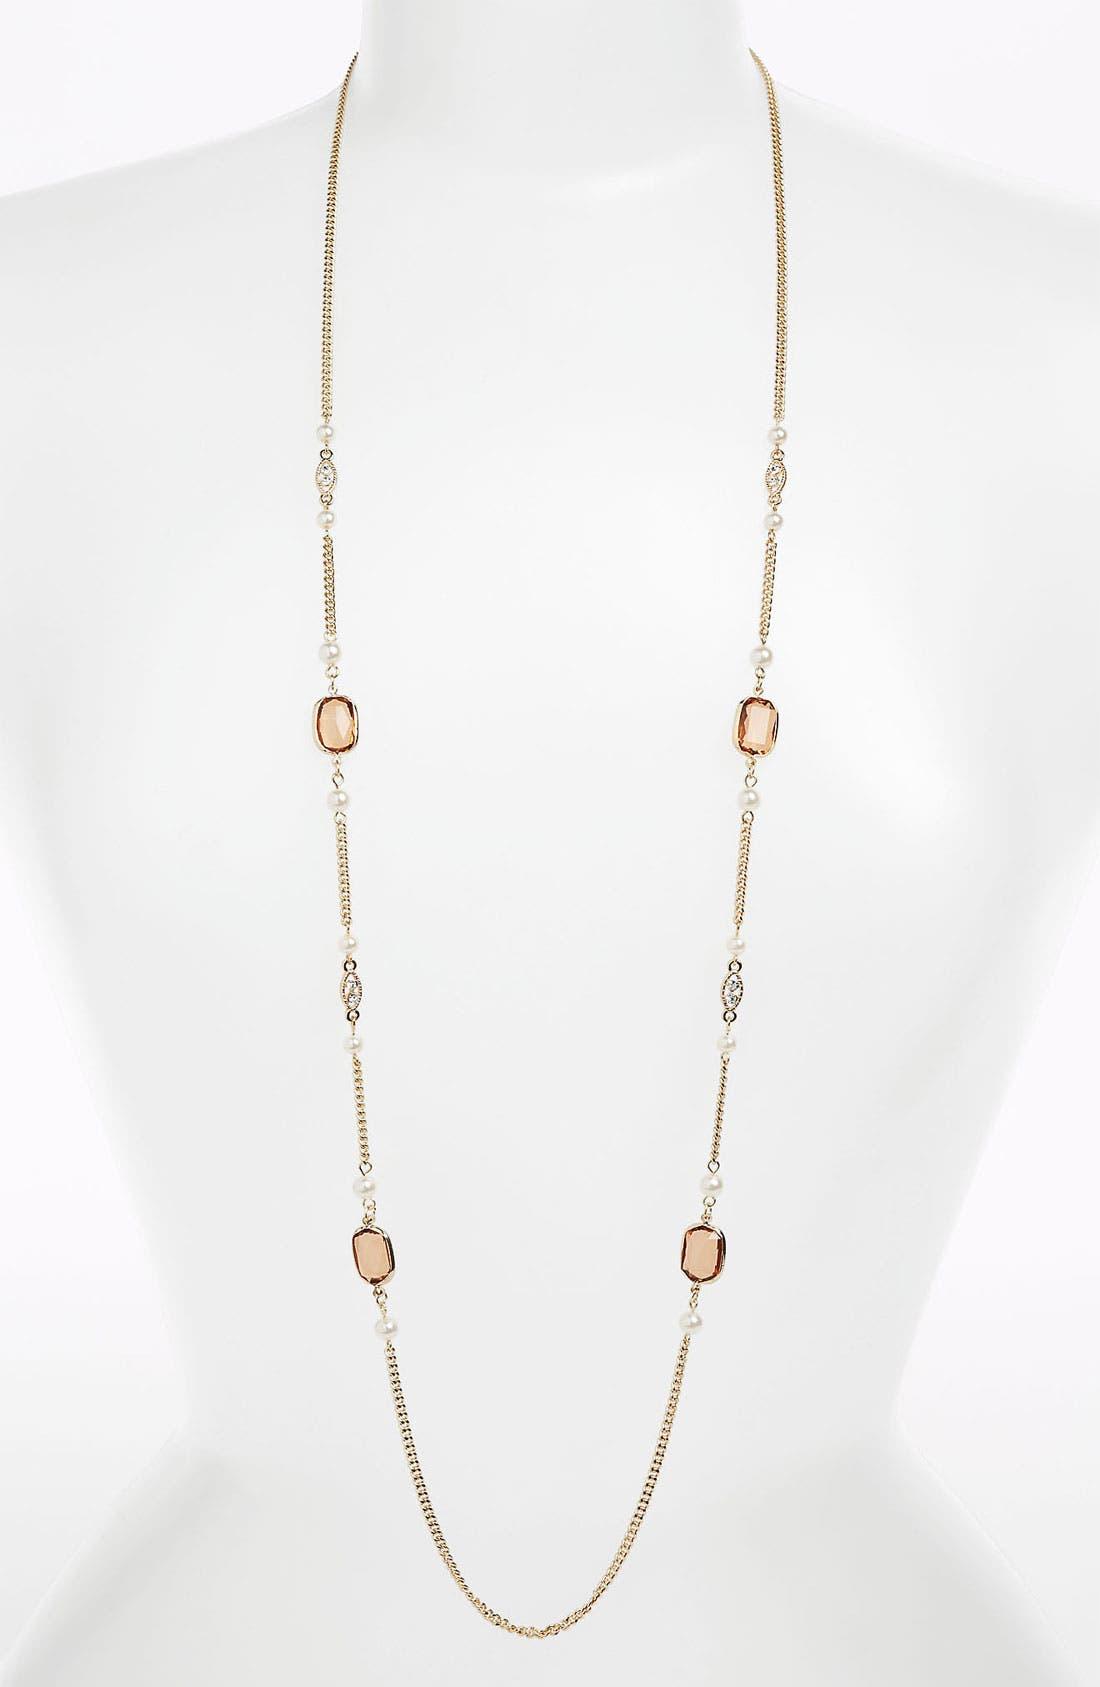 Alternate Image 1 Selected - Stephan & Co. Delicate Vintage Necklace